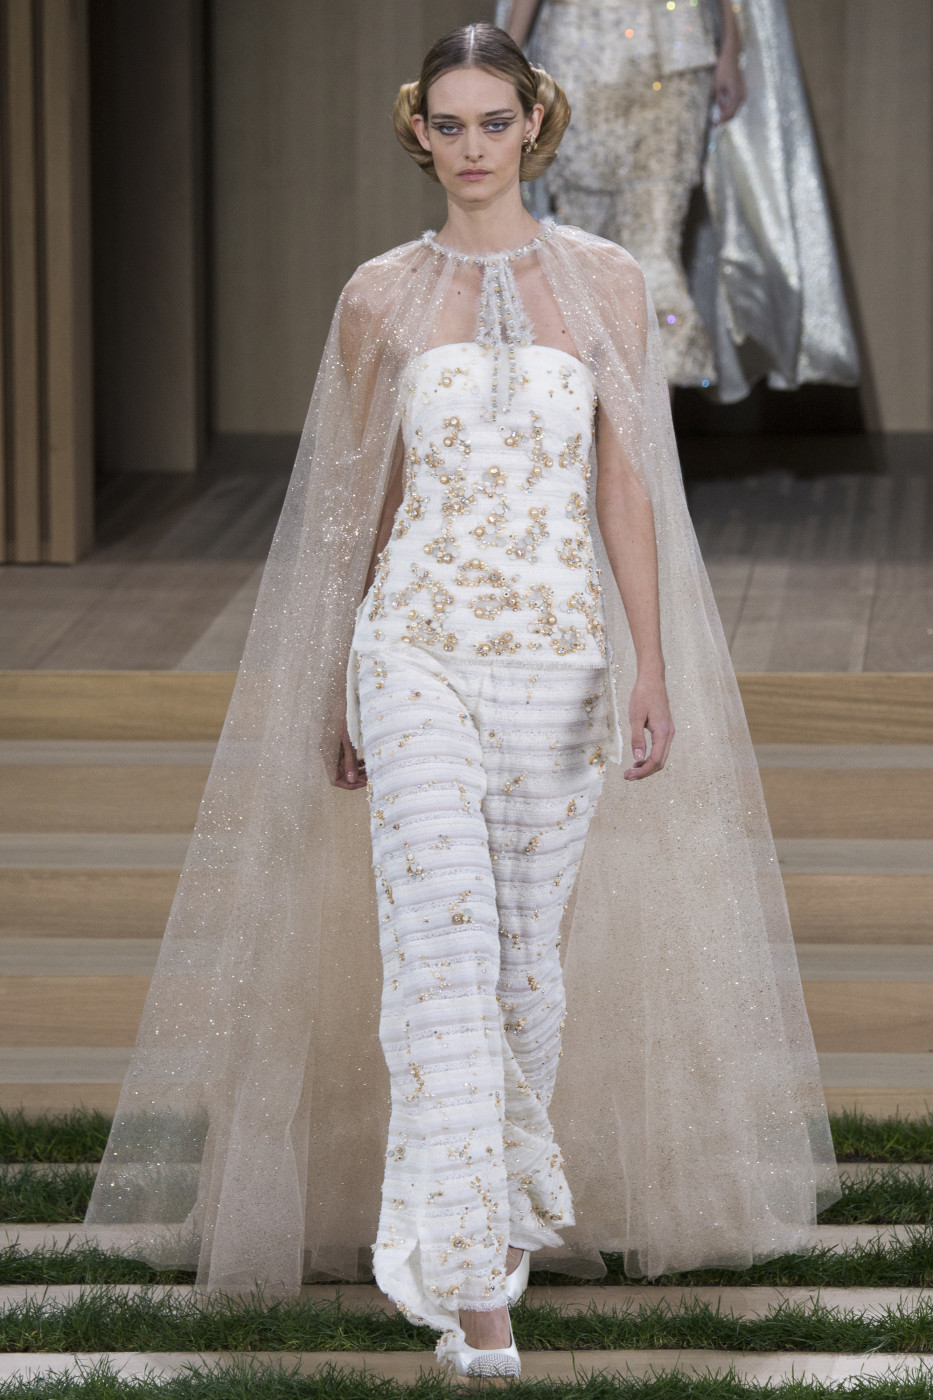 Nadine-Strittmatter_Chanel_Couture-Spring-2016_Phototogenics_1